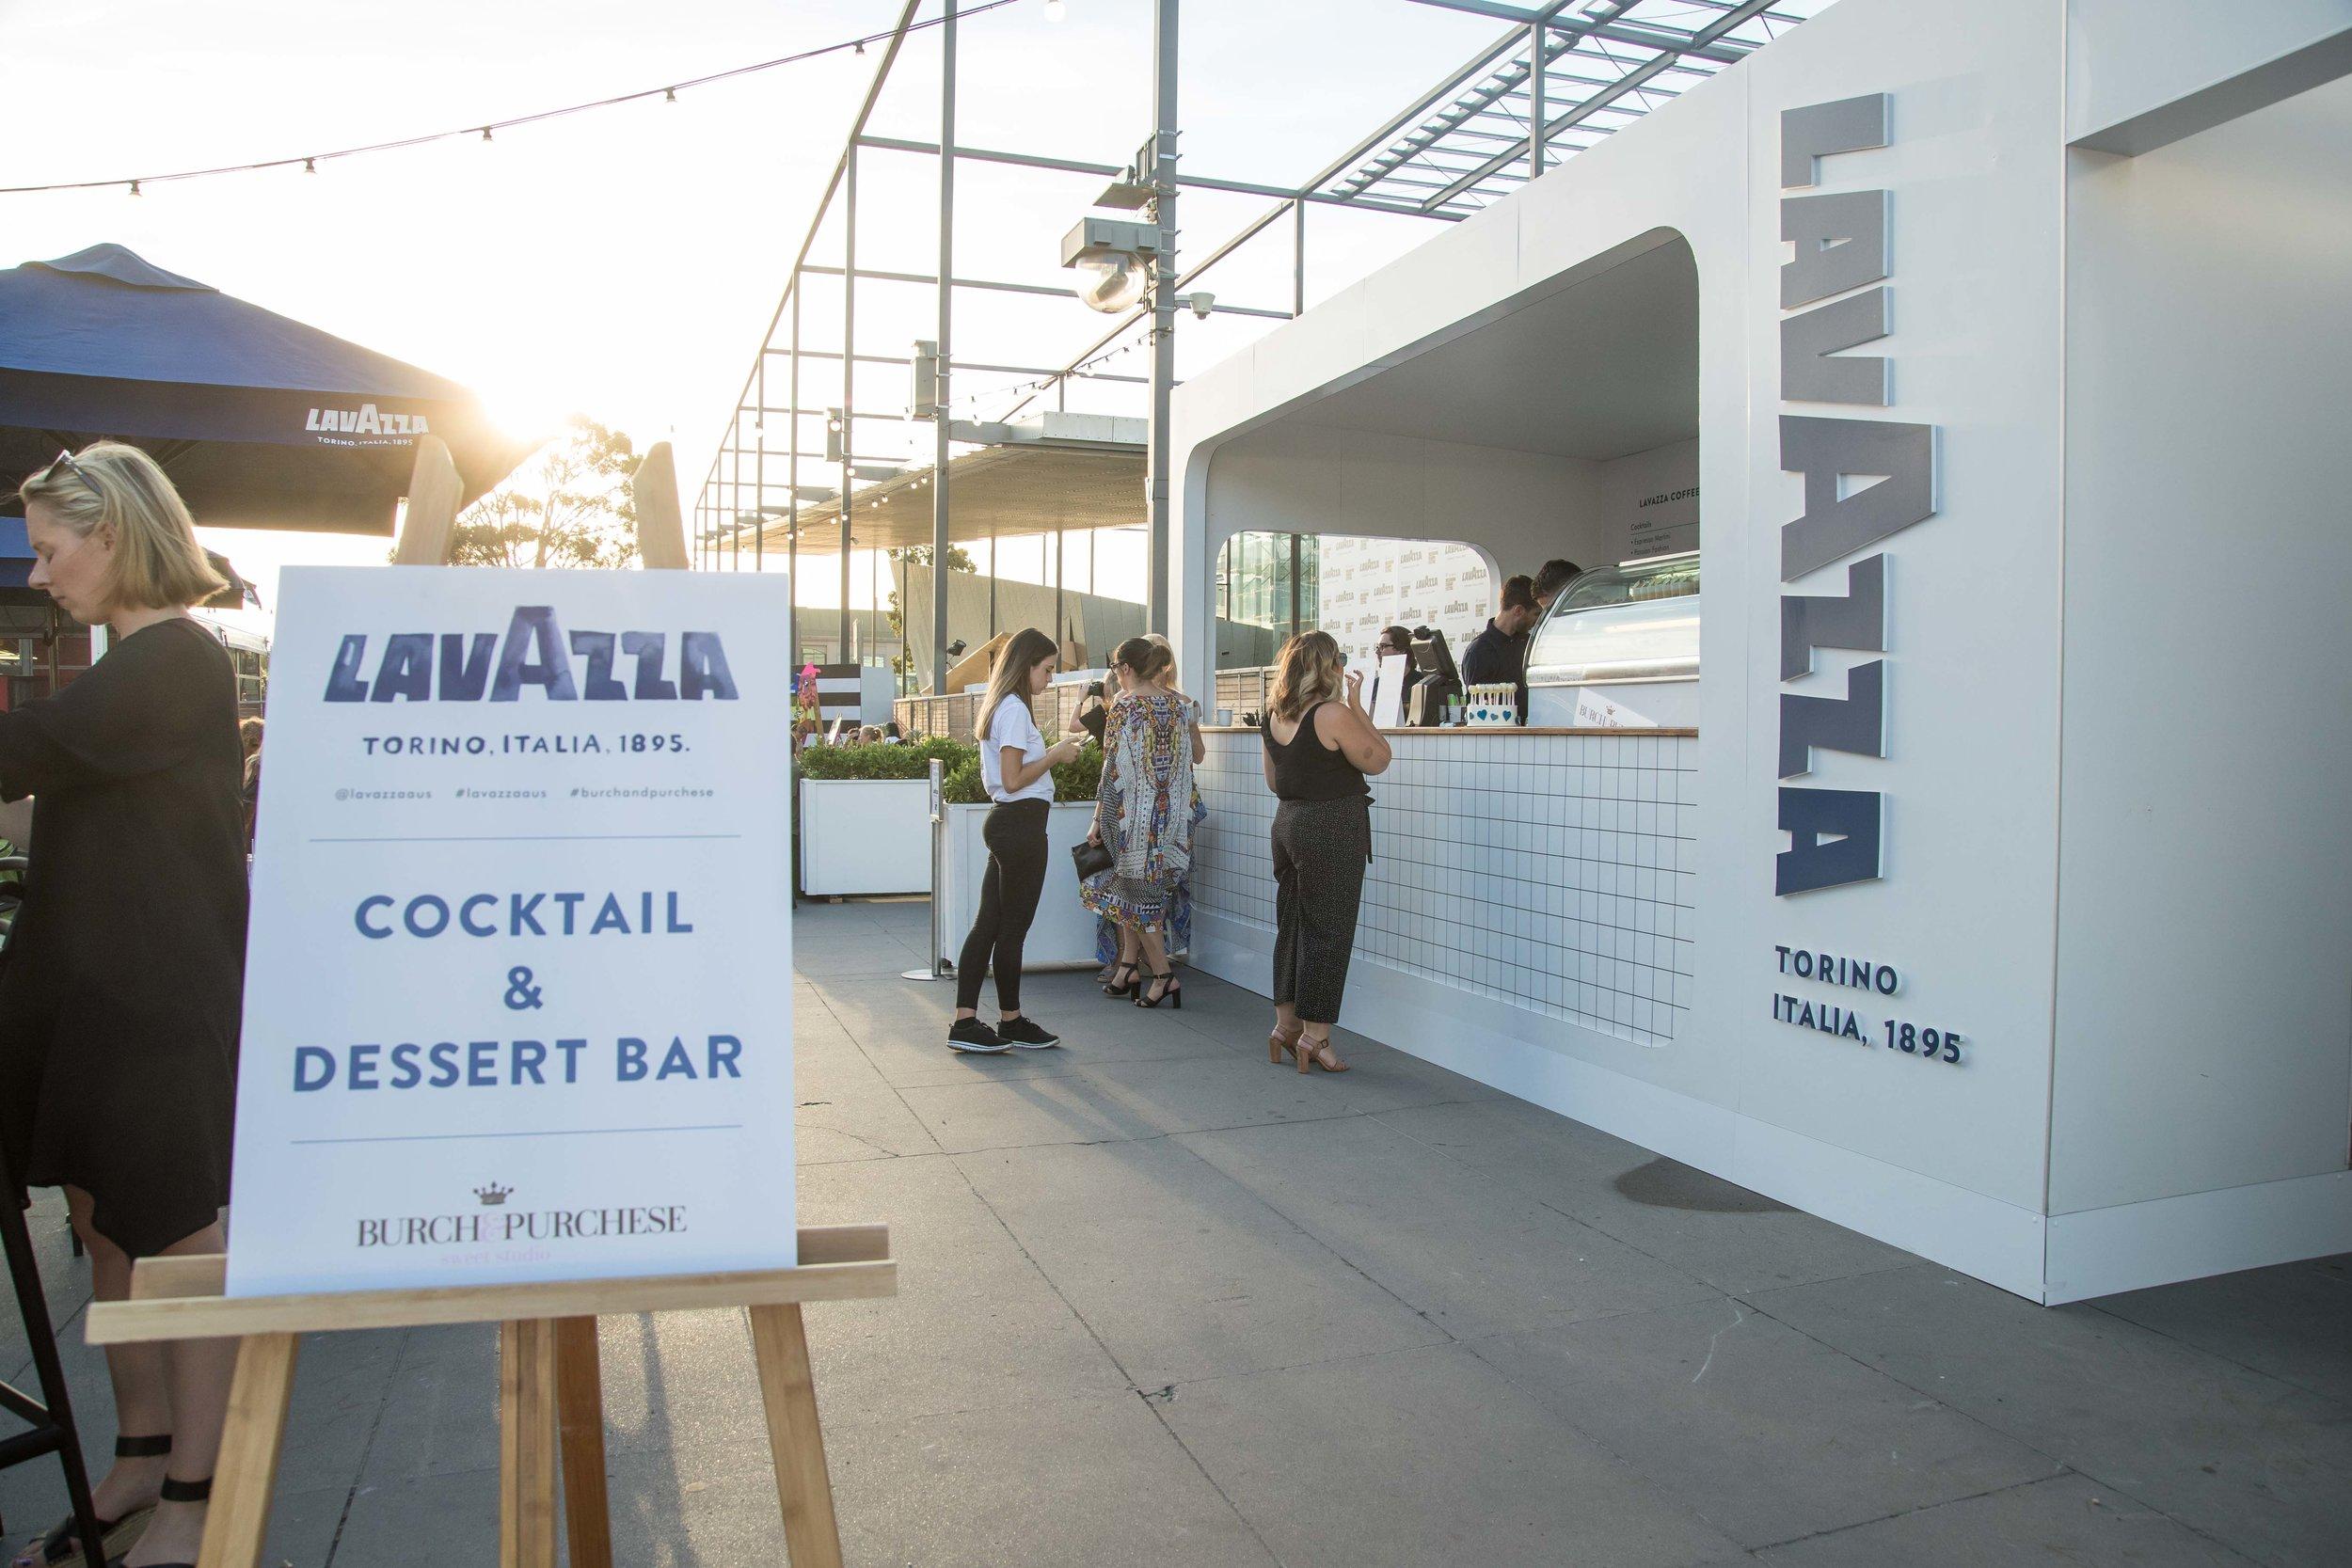 lavazza-vamff-2017-day-1-lavazza-cafe.jpg